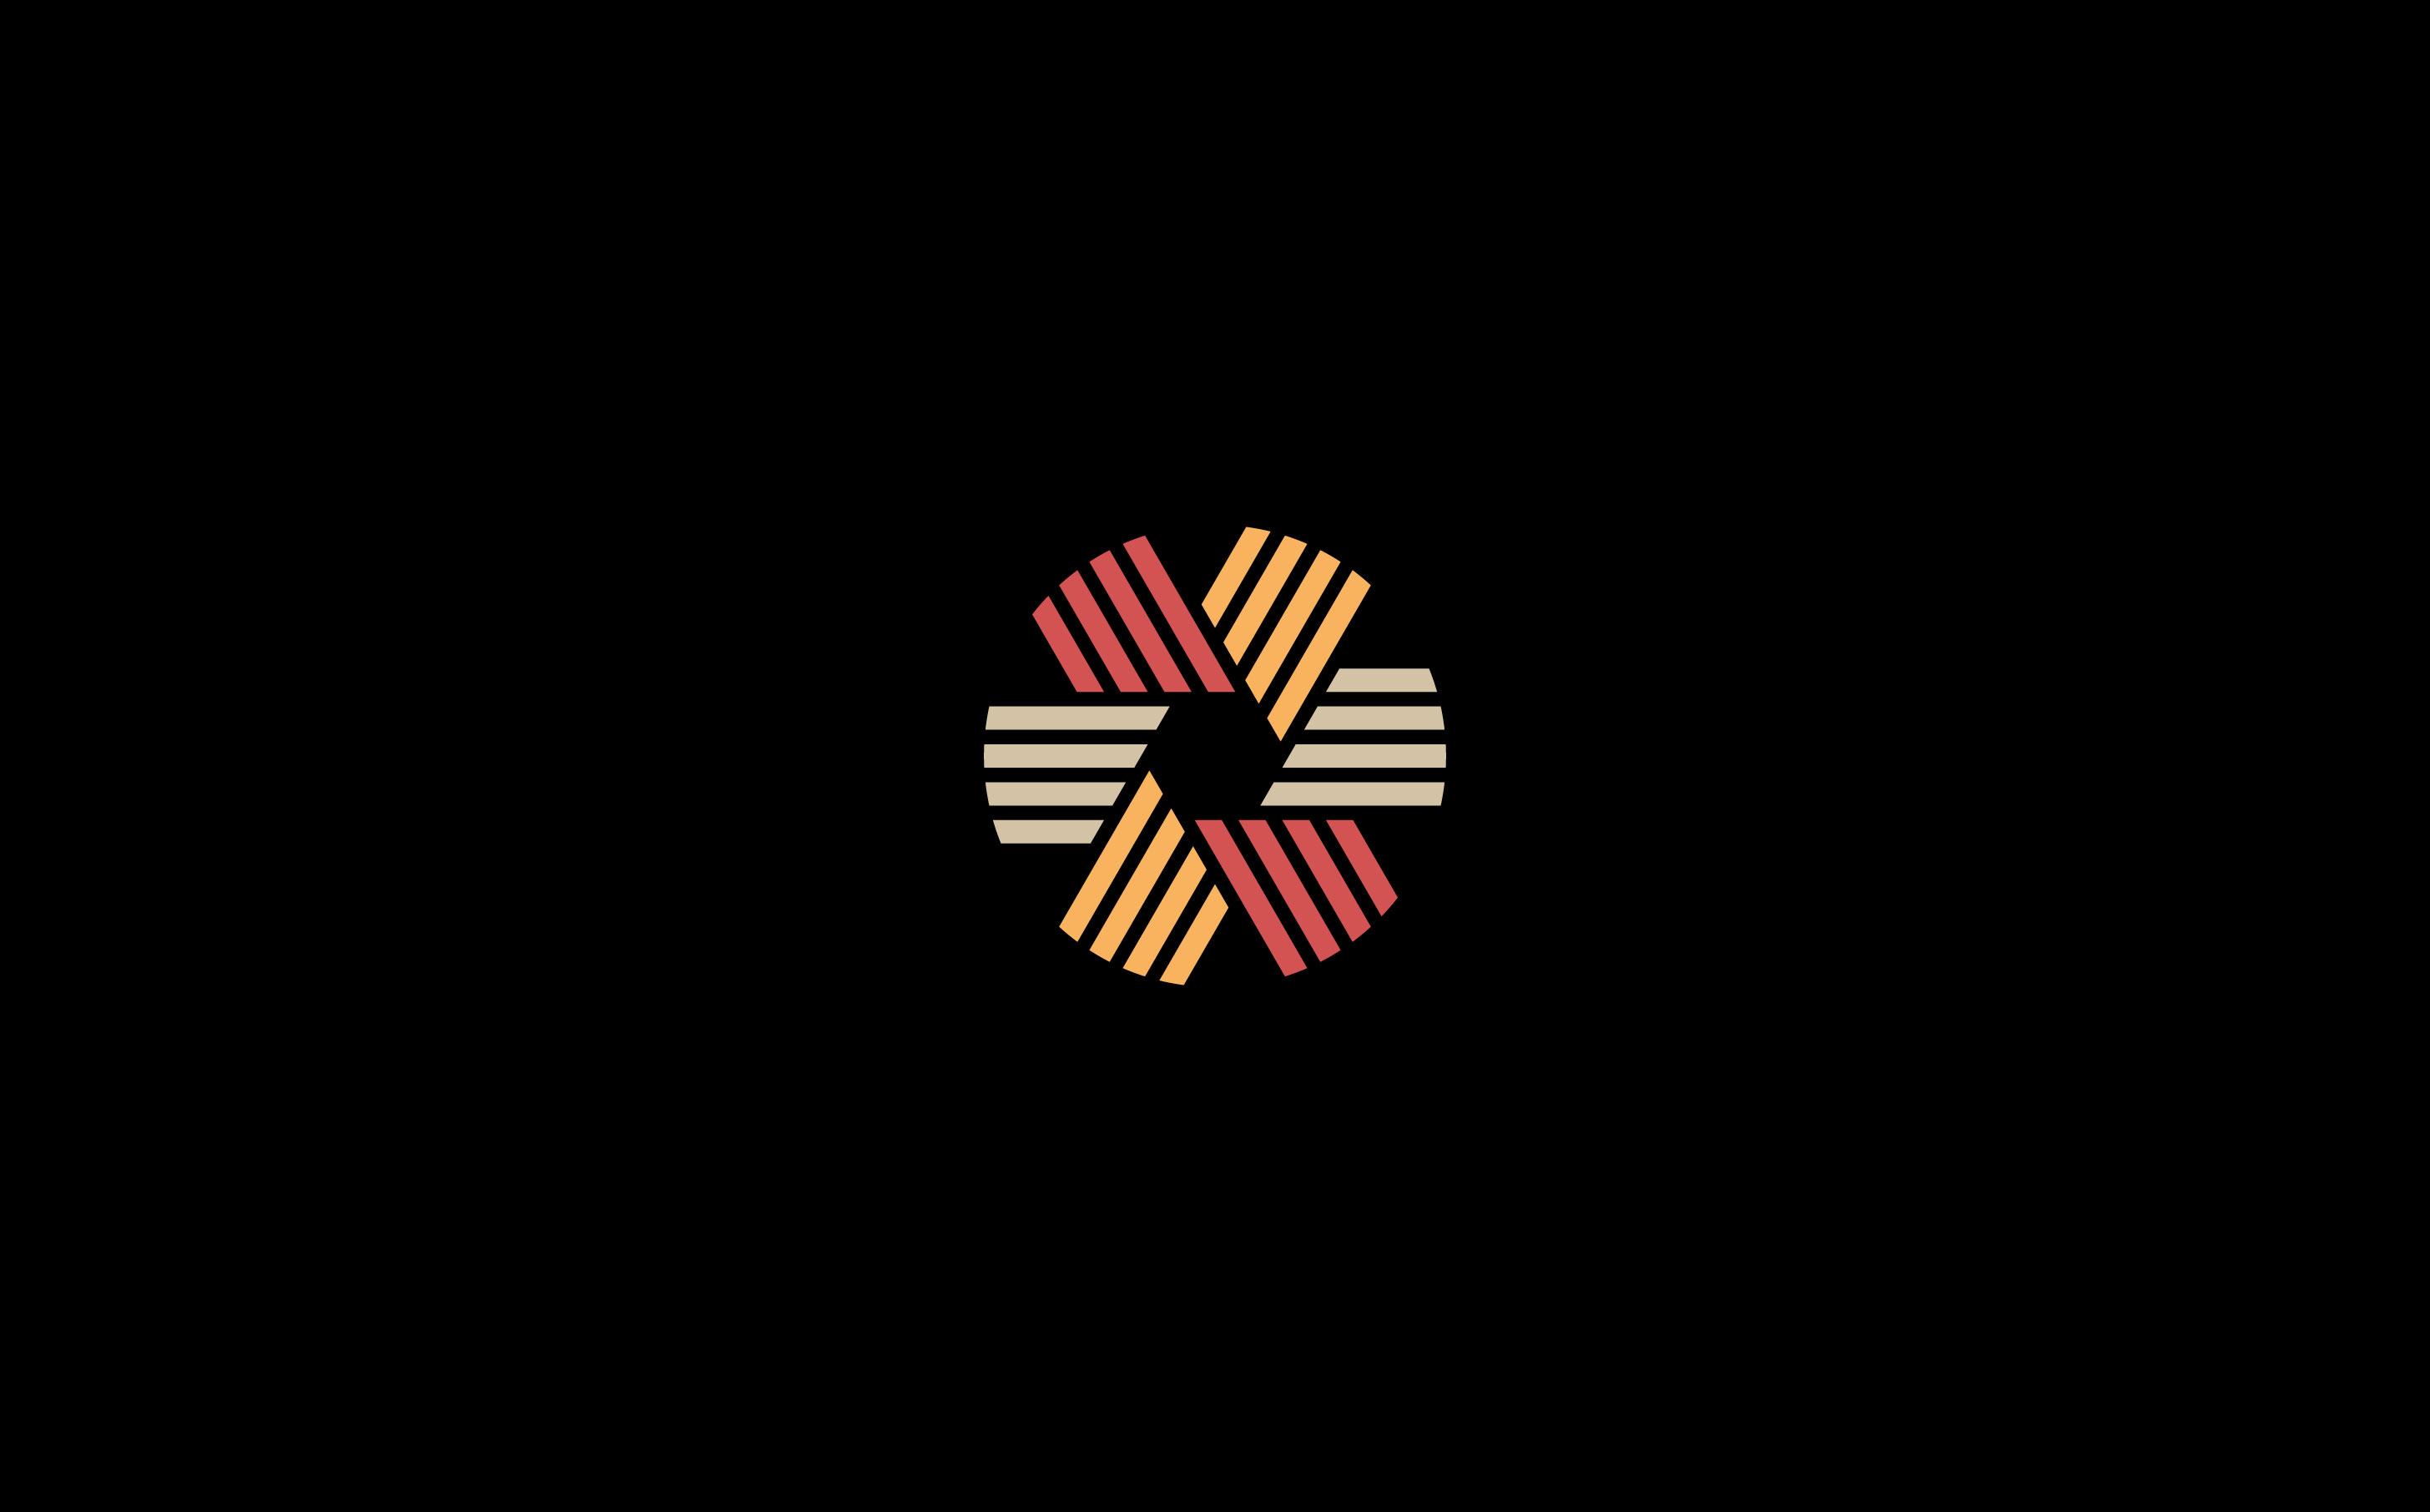 numbermill-logo-design-02